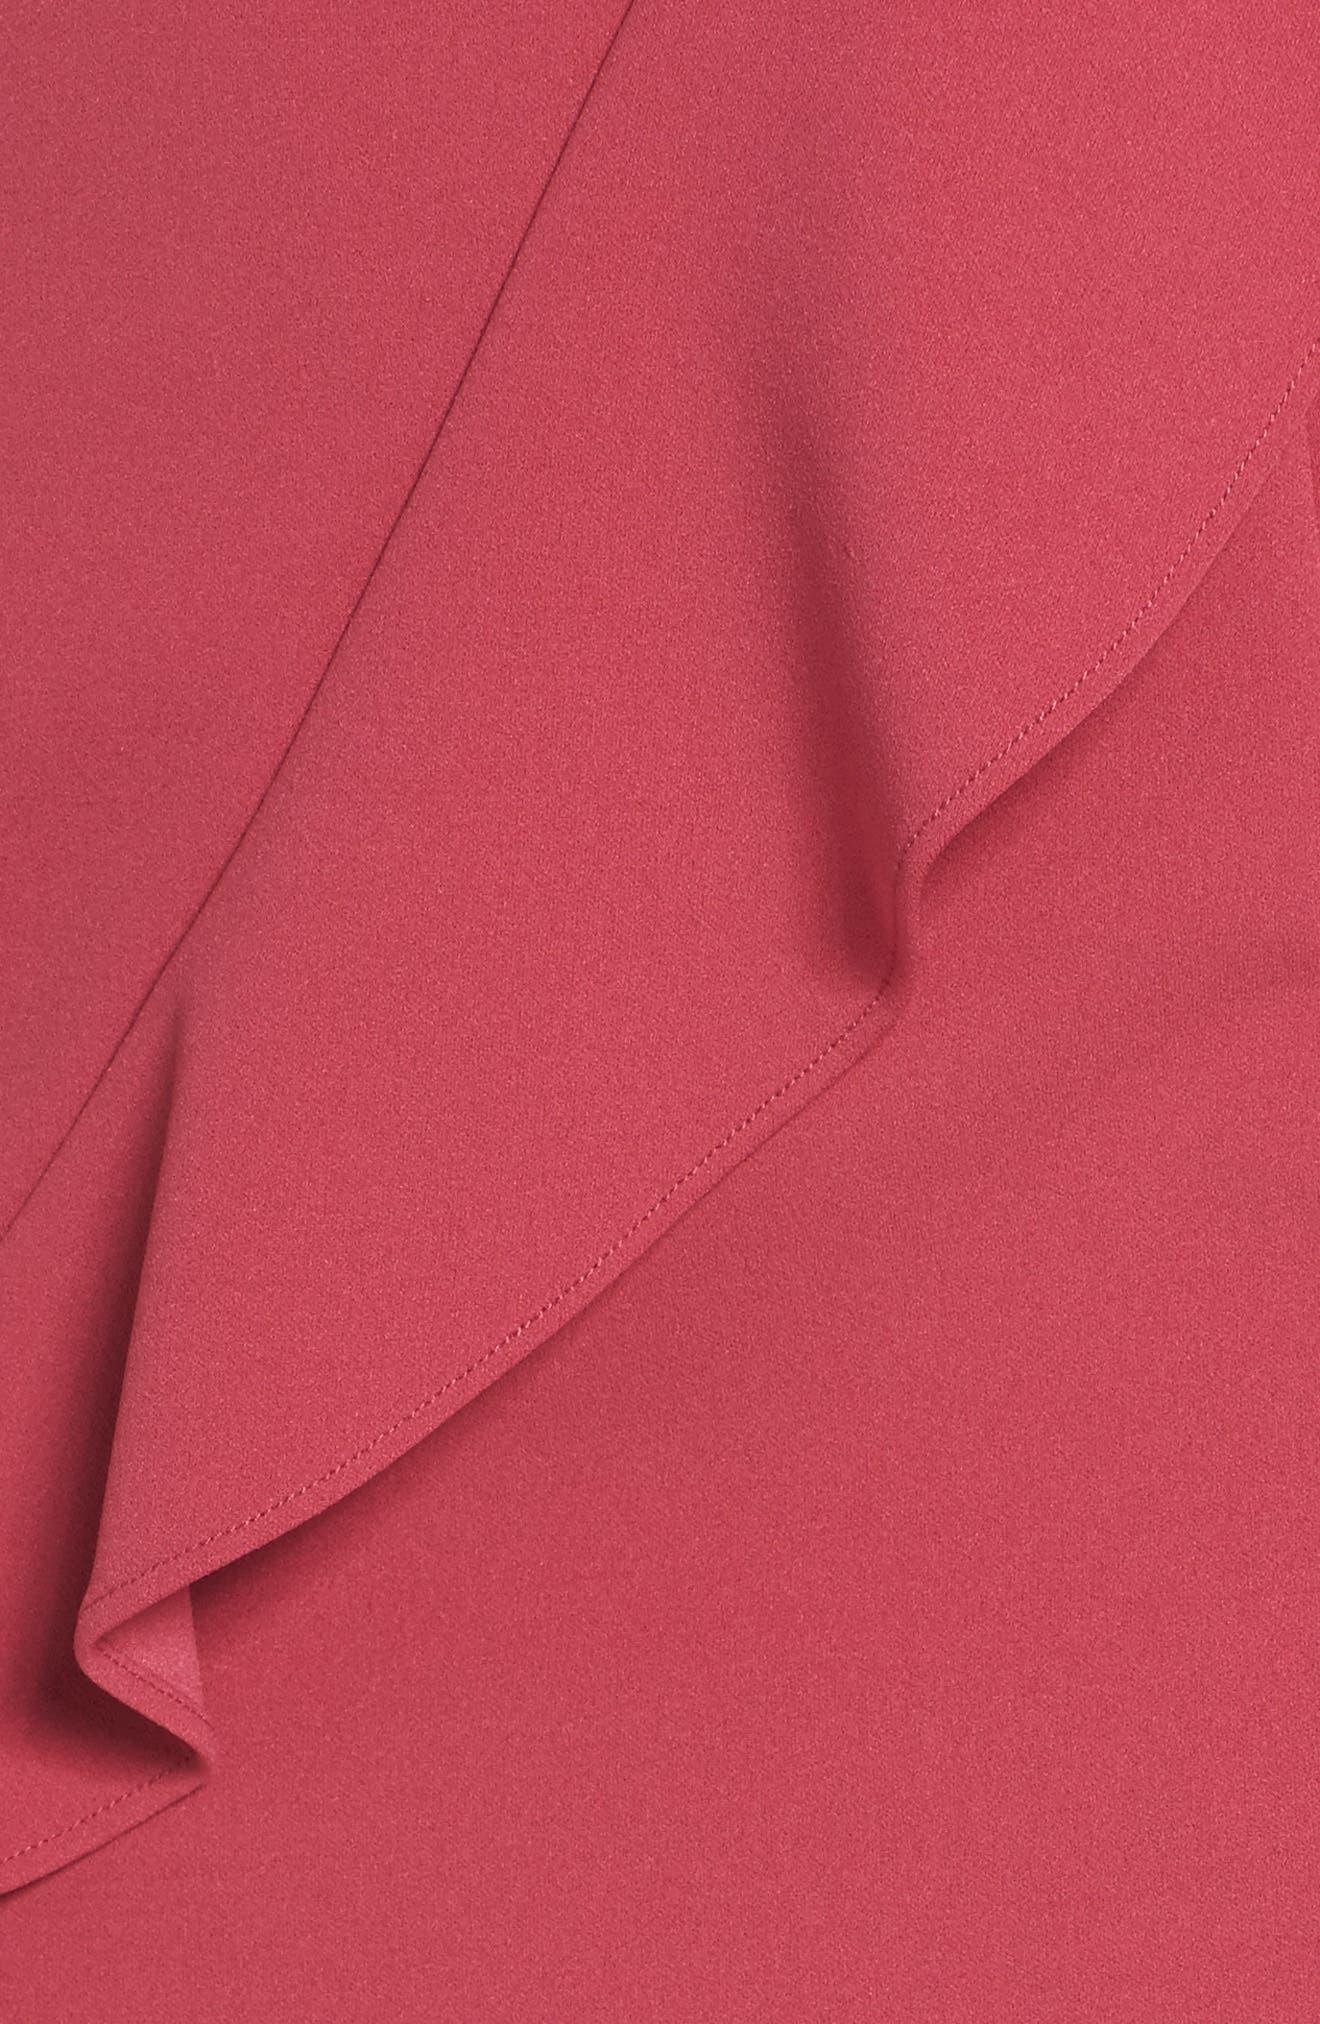 Ruffle Crepe Dress,                             Alternate thumbnail 5, color,                             Faded Azalea